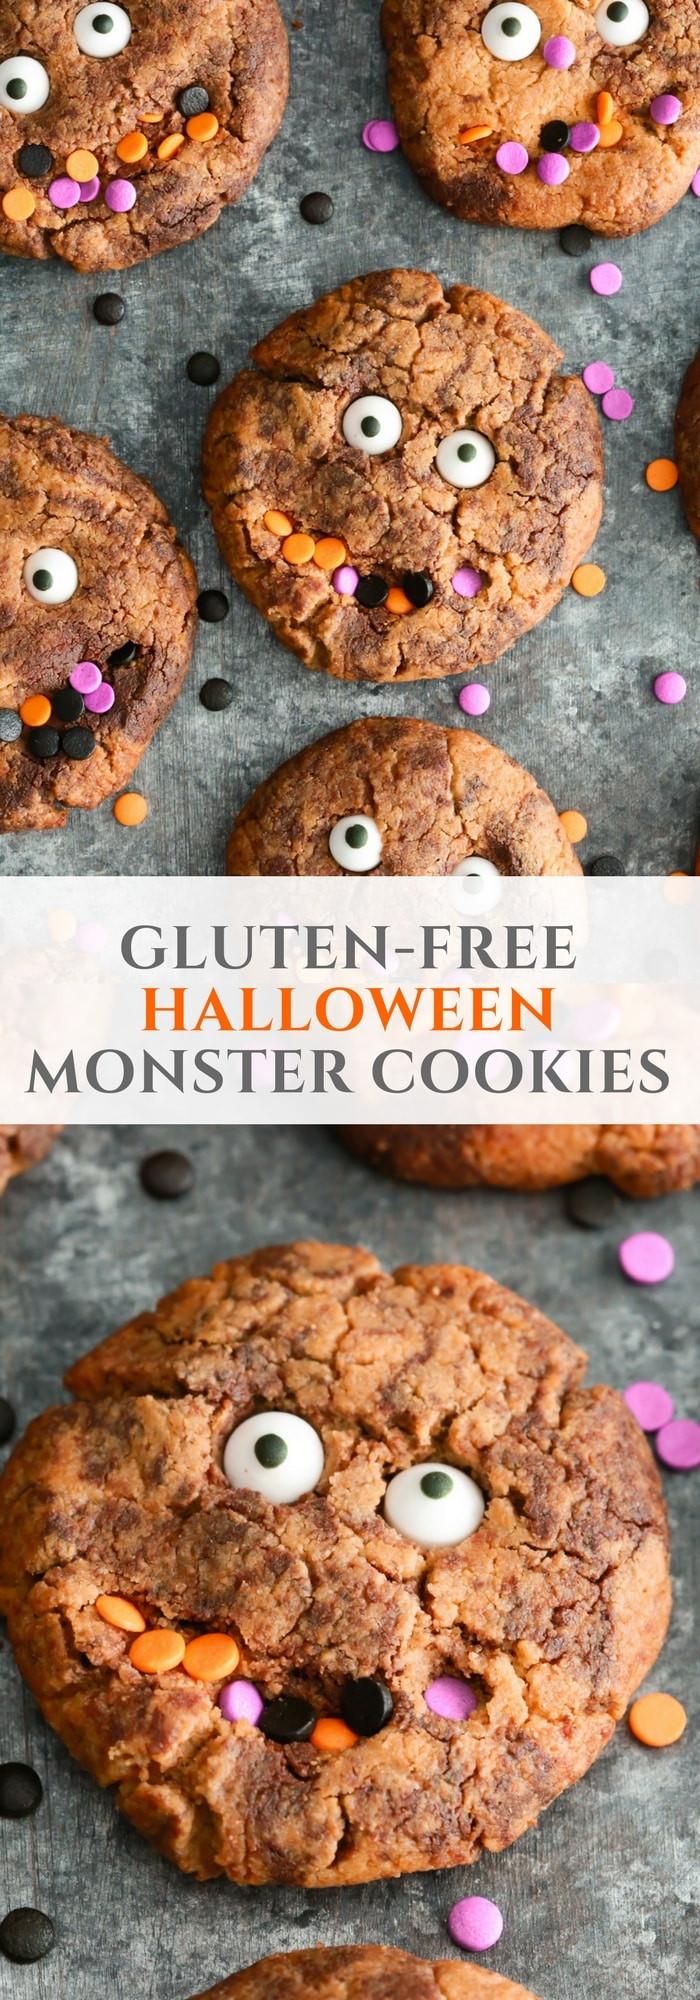 Gluten Free Halloween Cookies  Gluten free Halloween Monster Cookies Primavera Kitchen